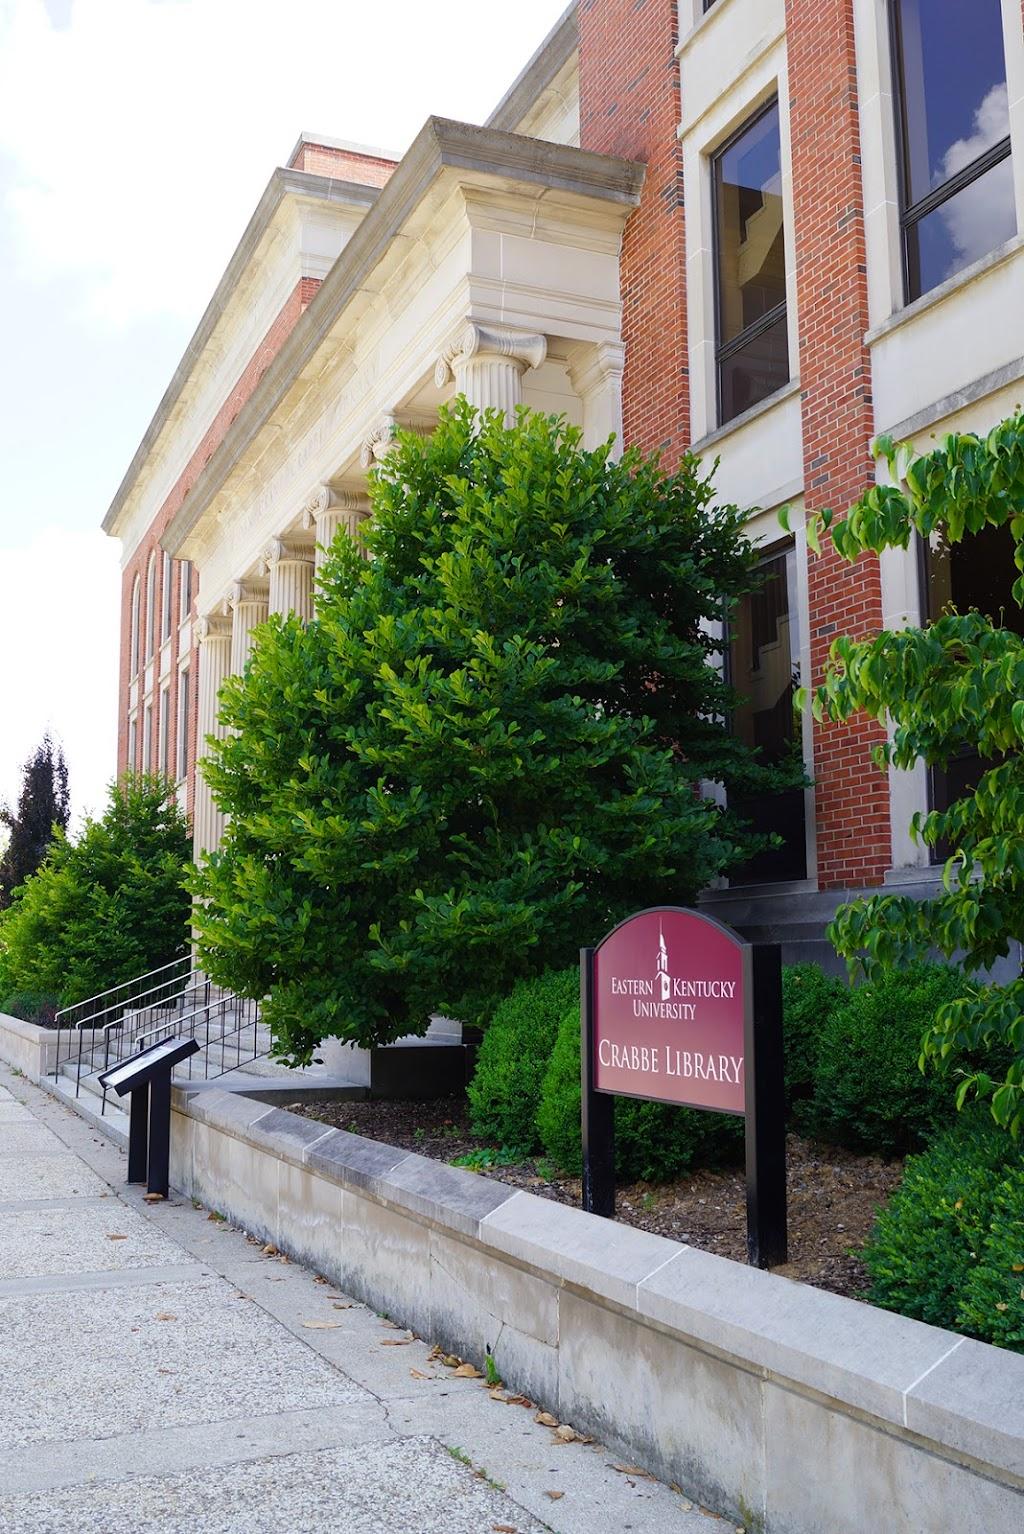 Eastern Kentucky University Libraries - library  | Photo 10 of 10 | Address: 583 University Dr, Richmond, KY 40475, USA | Phone: (859) 622-1790